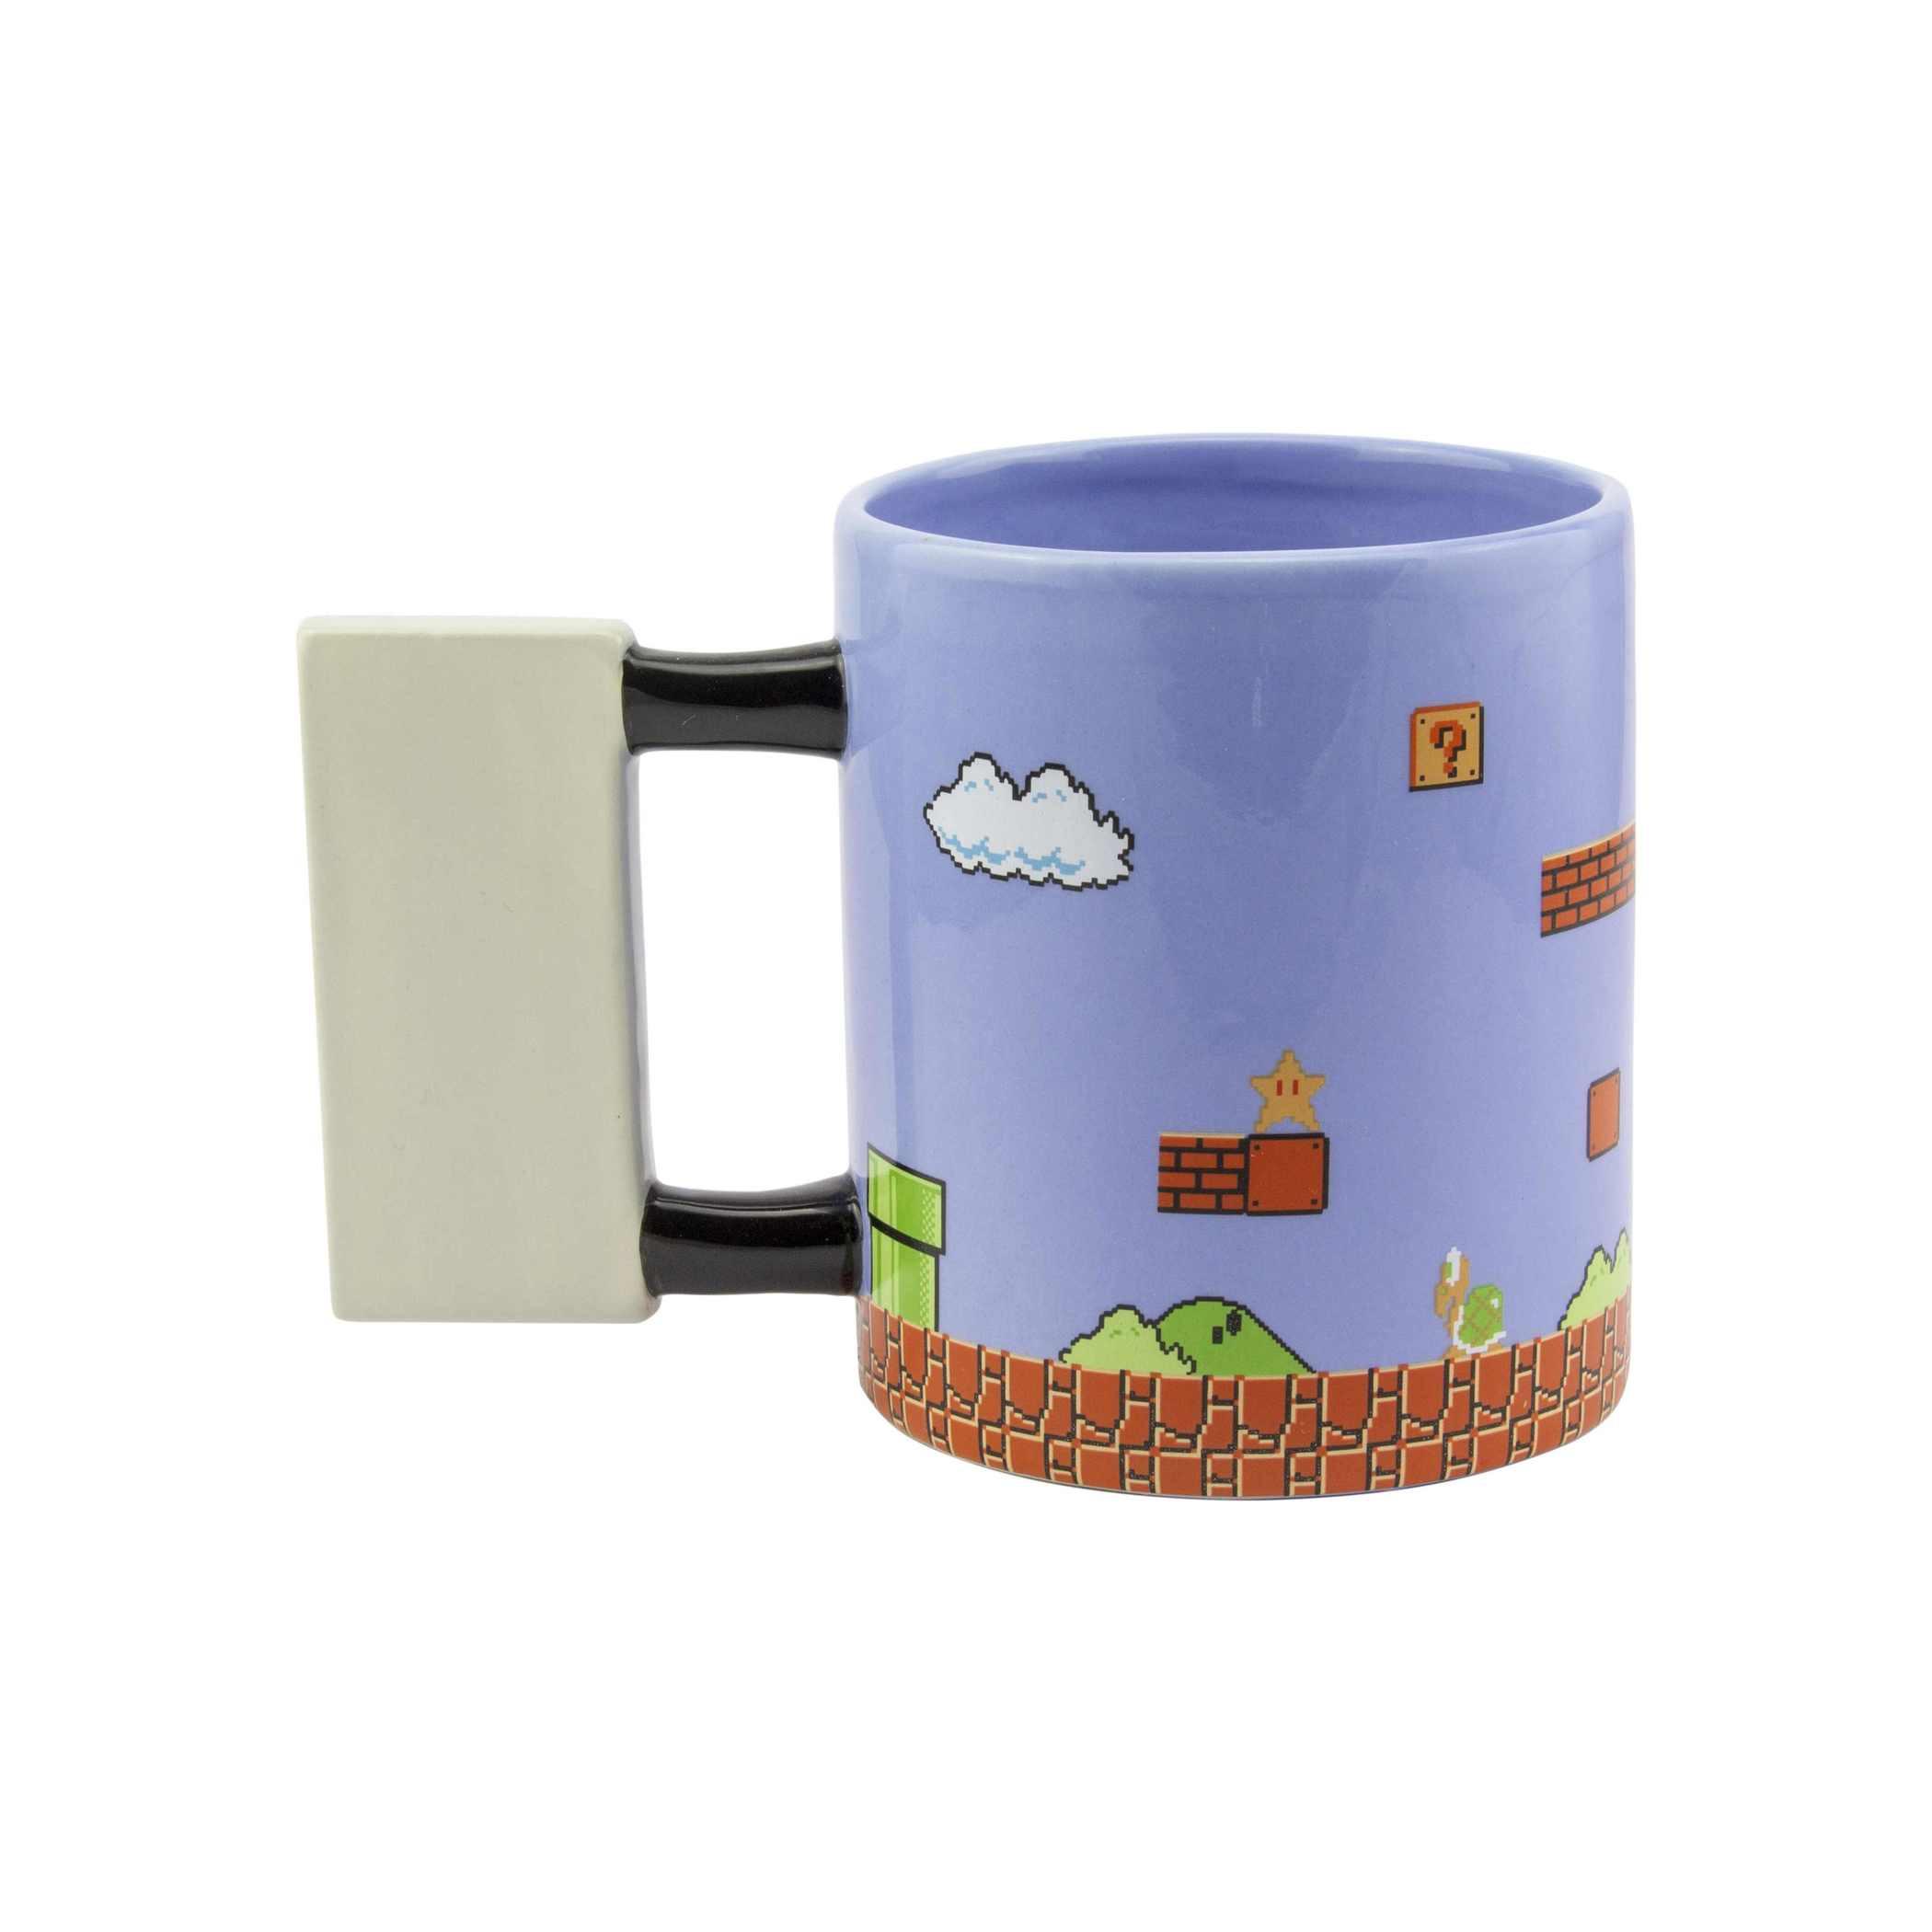 NES Controller Shaped Handle Mug